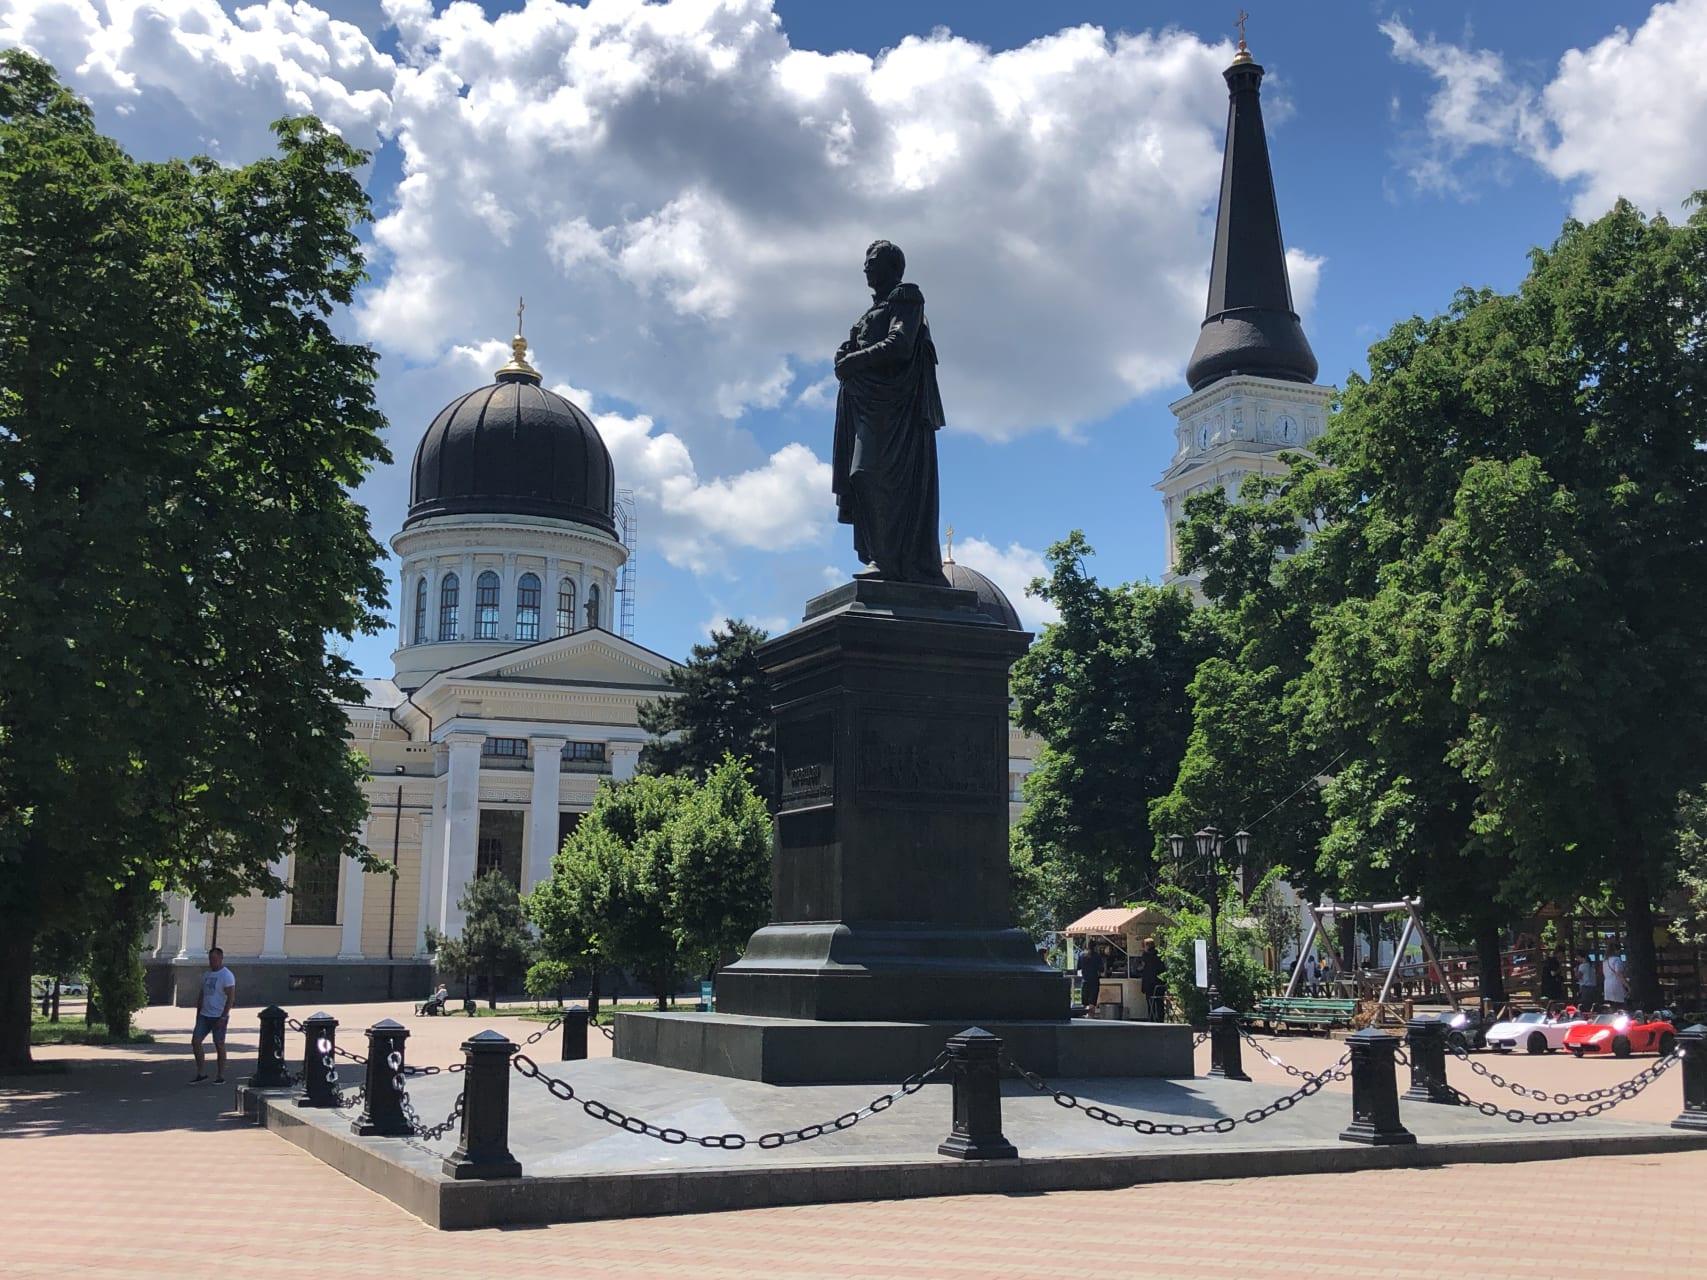 Odessa - Odessa City Walk. Part 4. The City Churches and Hidden Gems